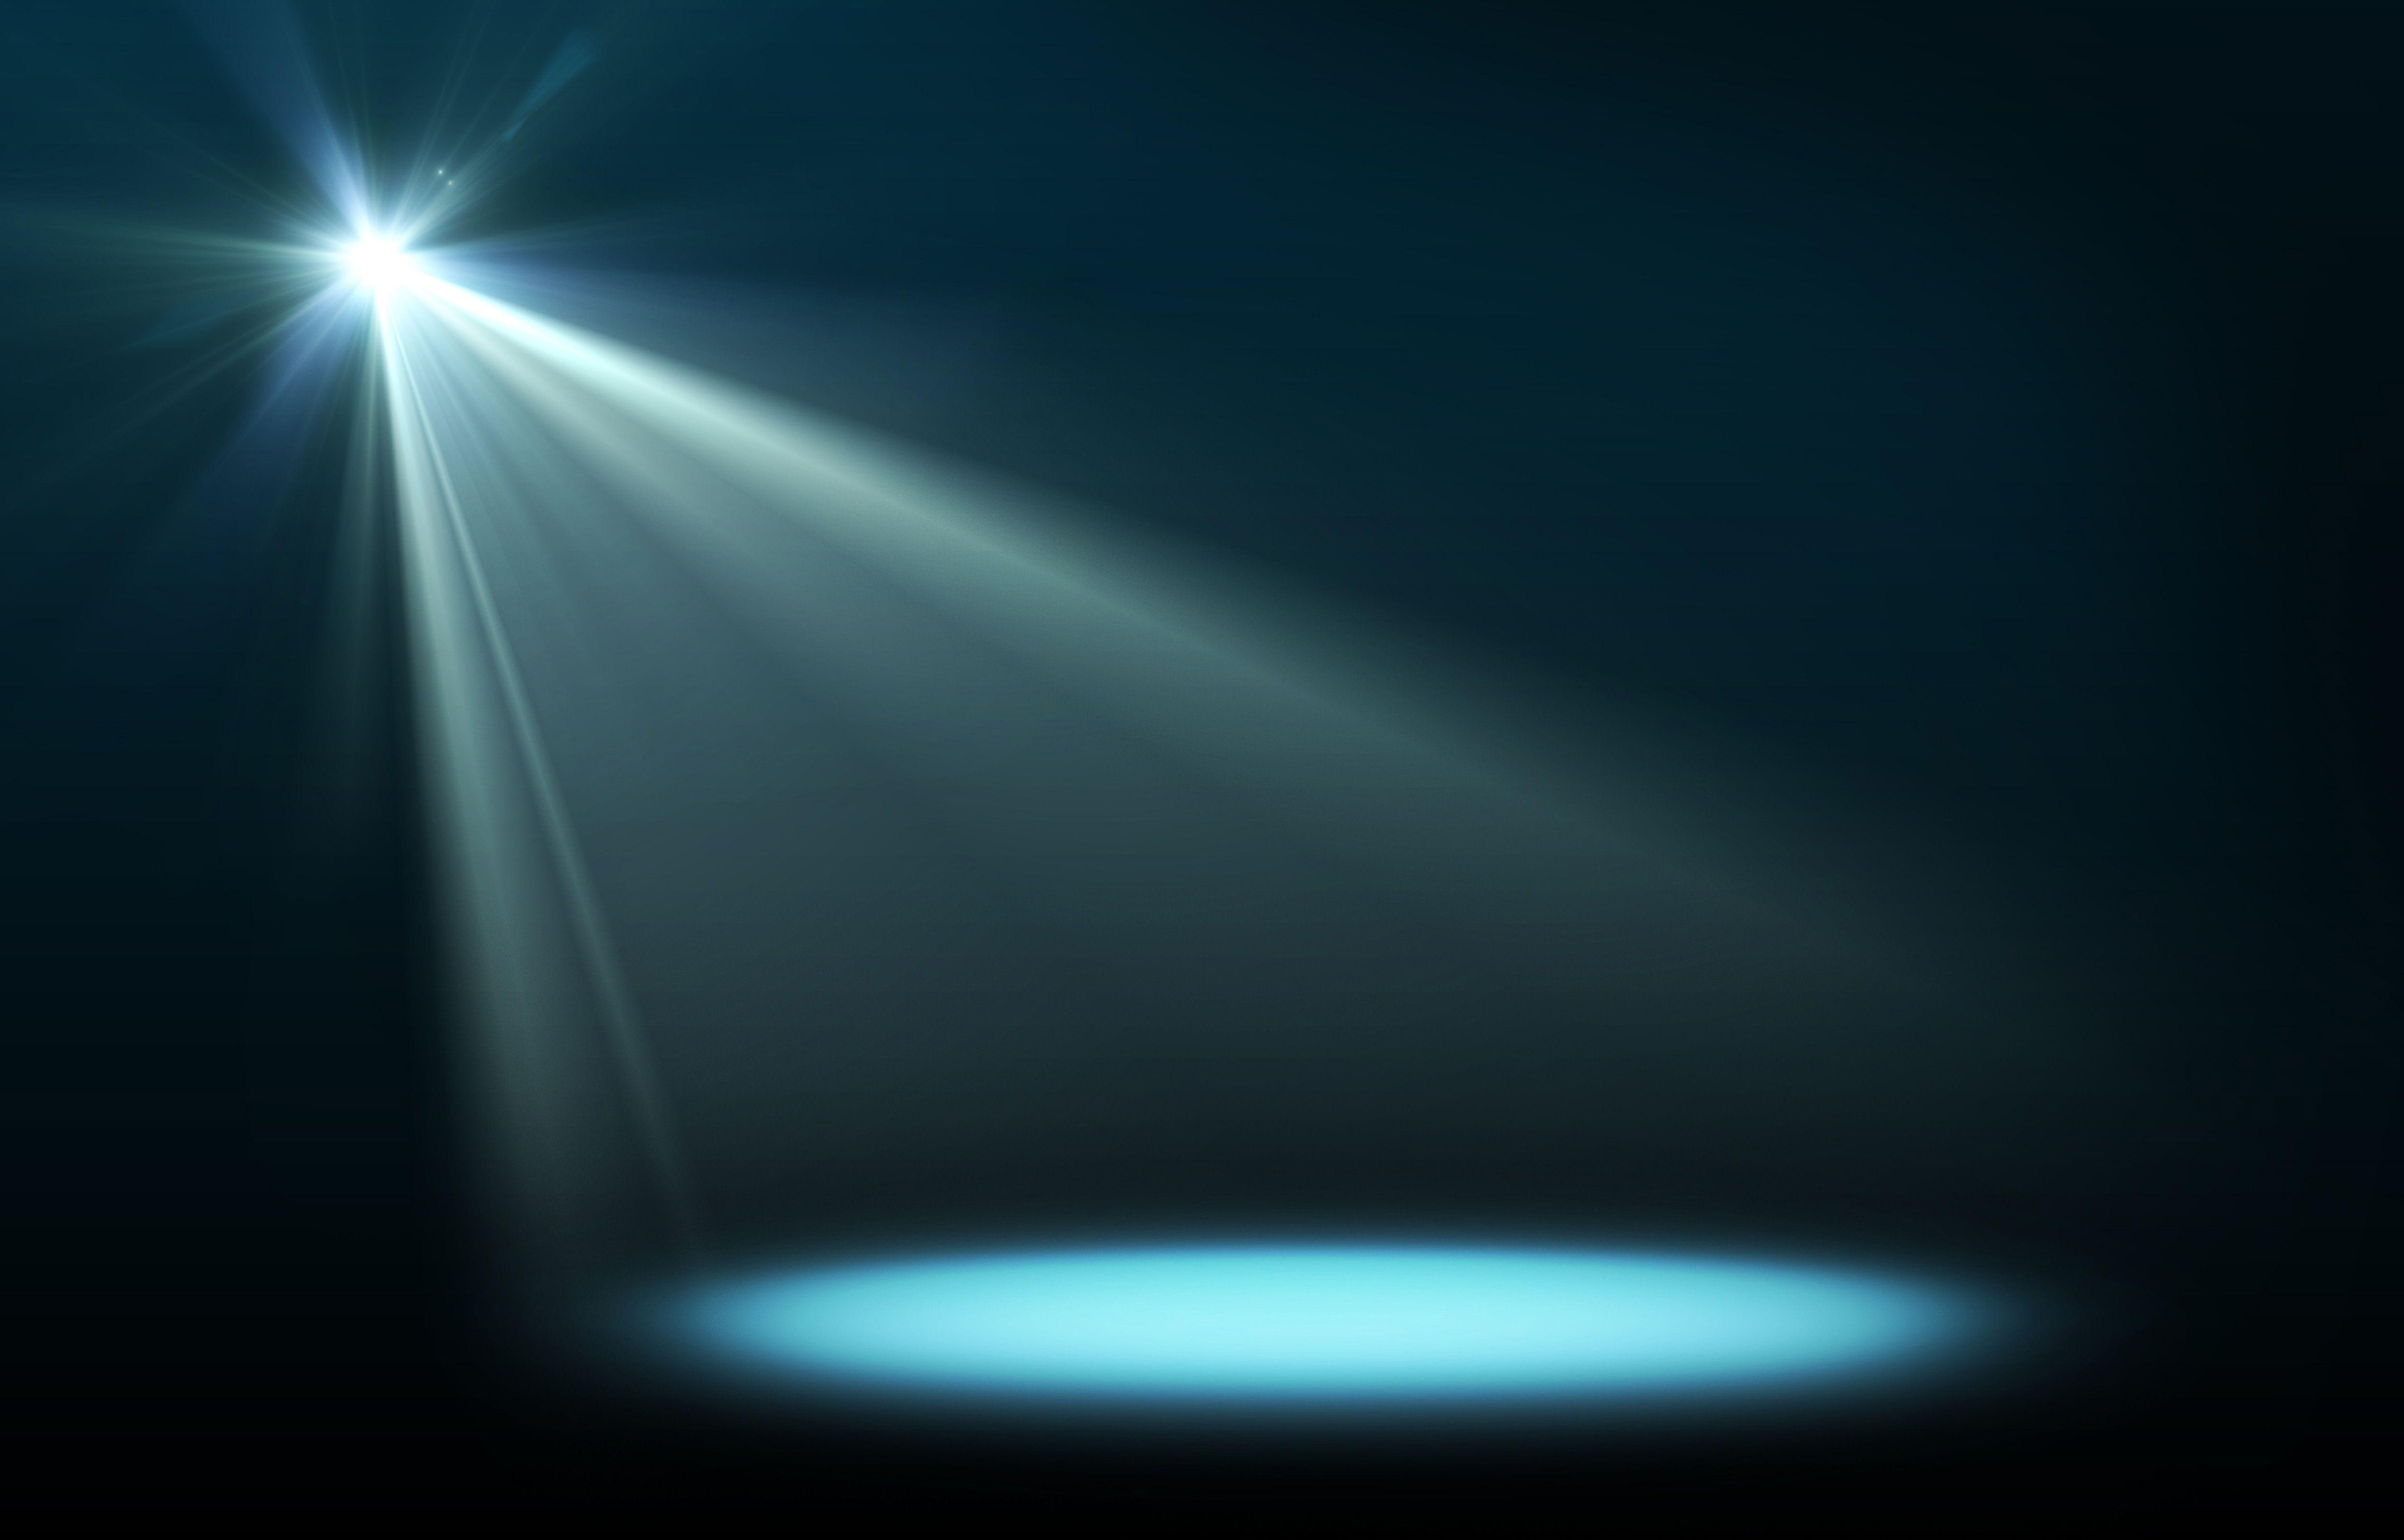 Stage curtains spotlight - Stage Spotlights